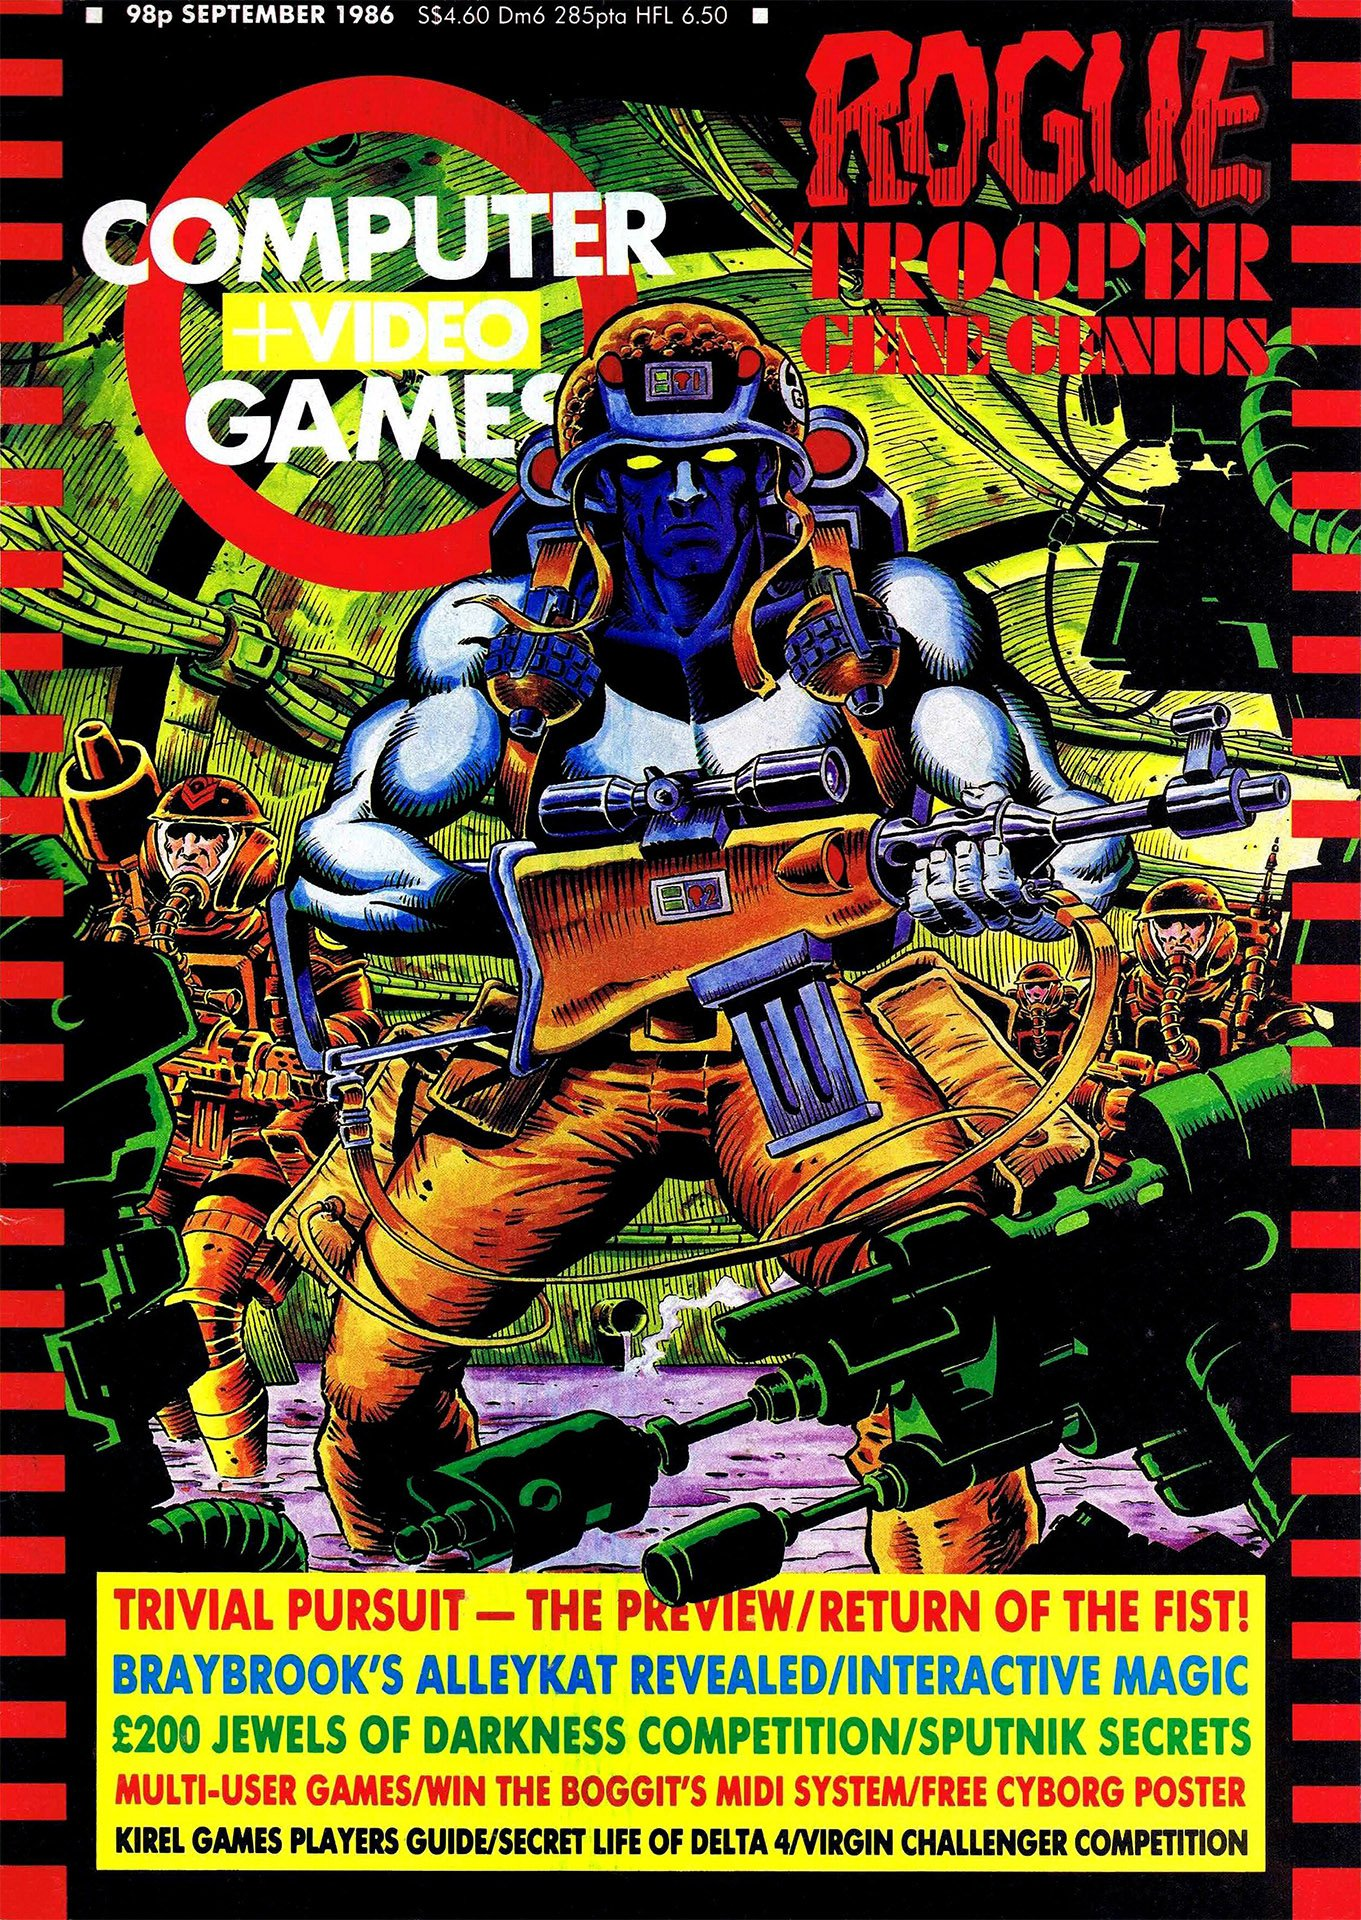 Computer & Video Games 059 (September 1986)